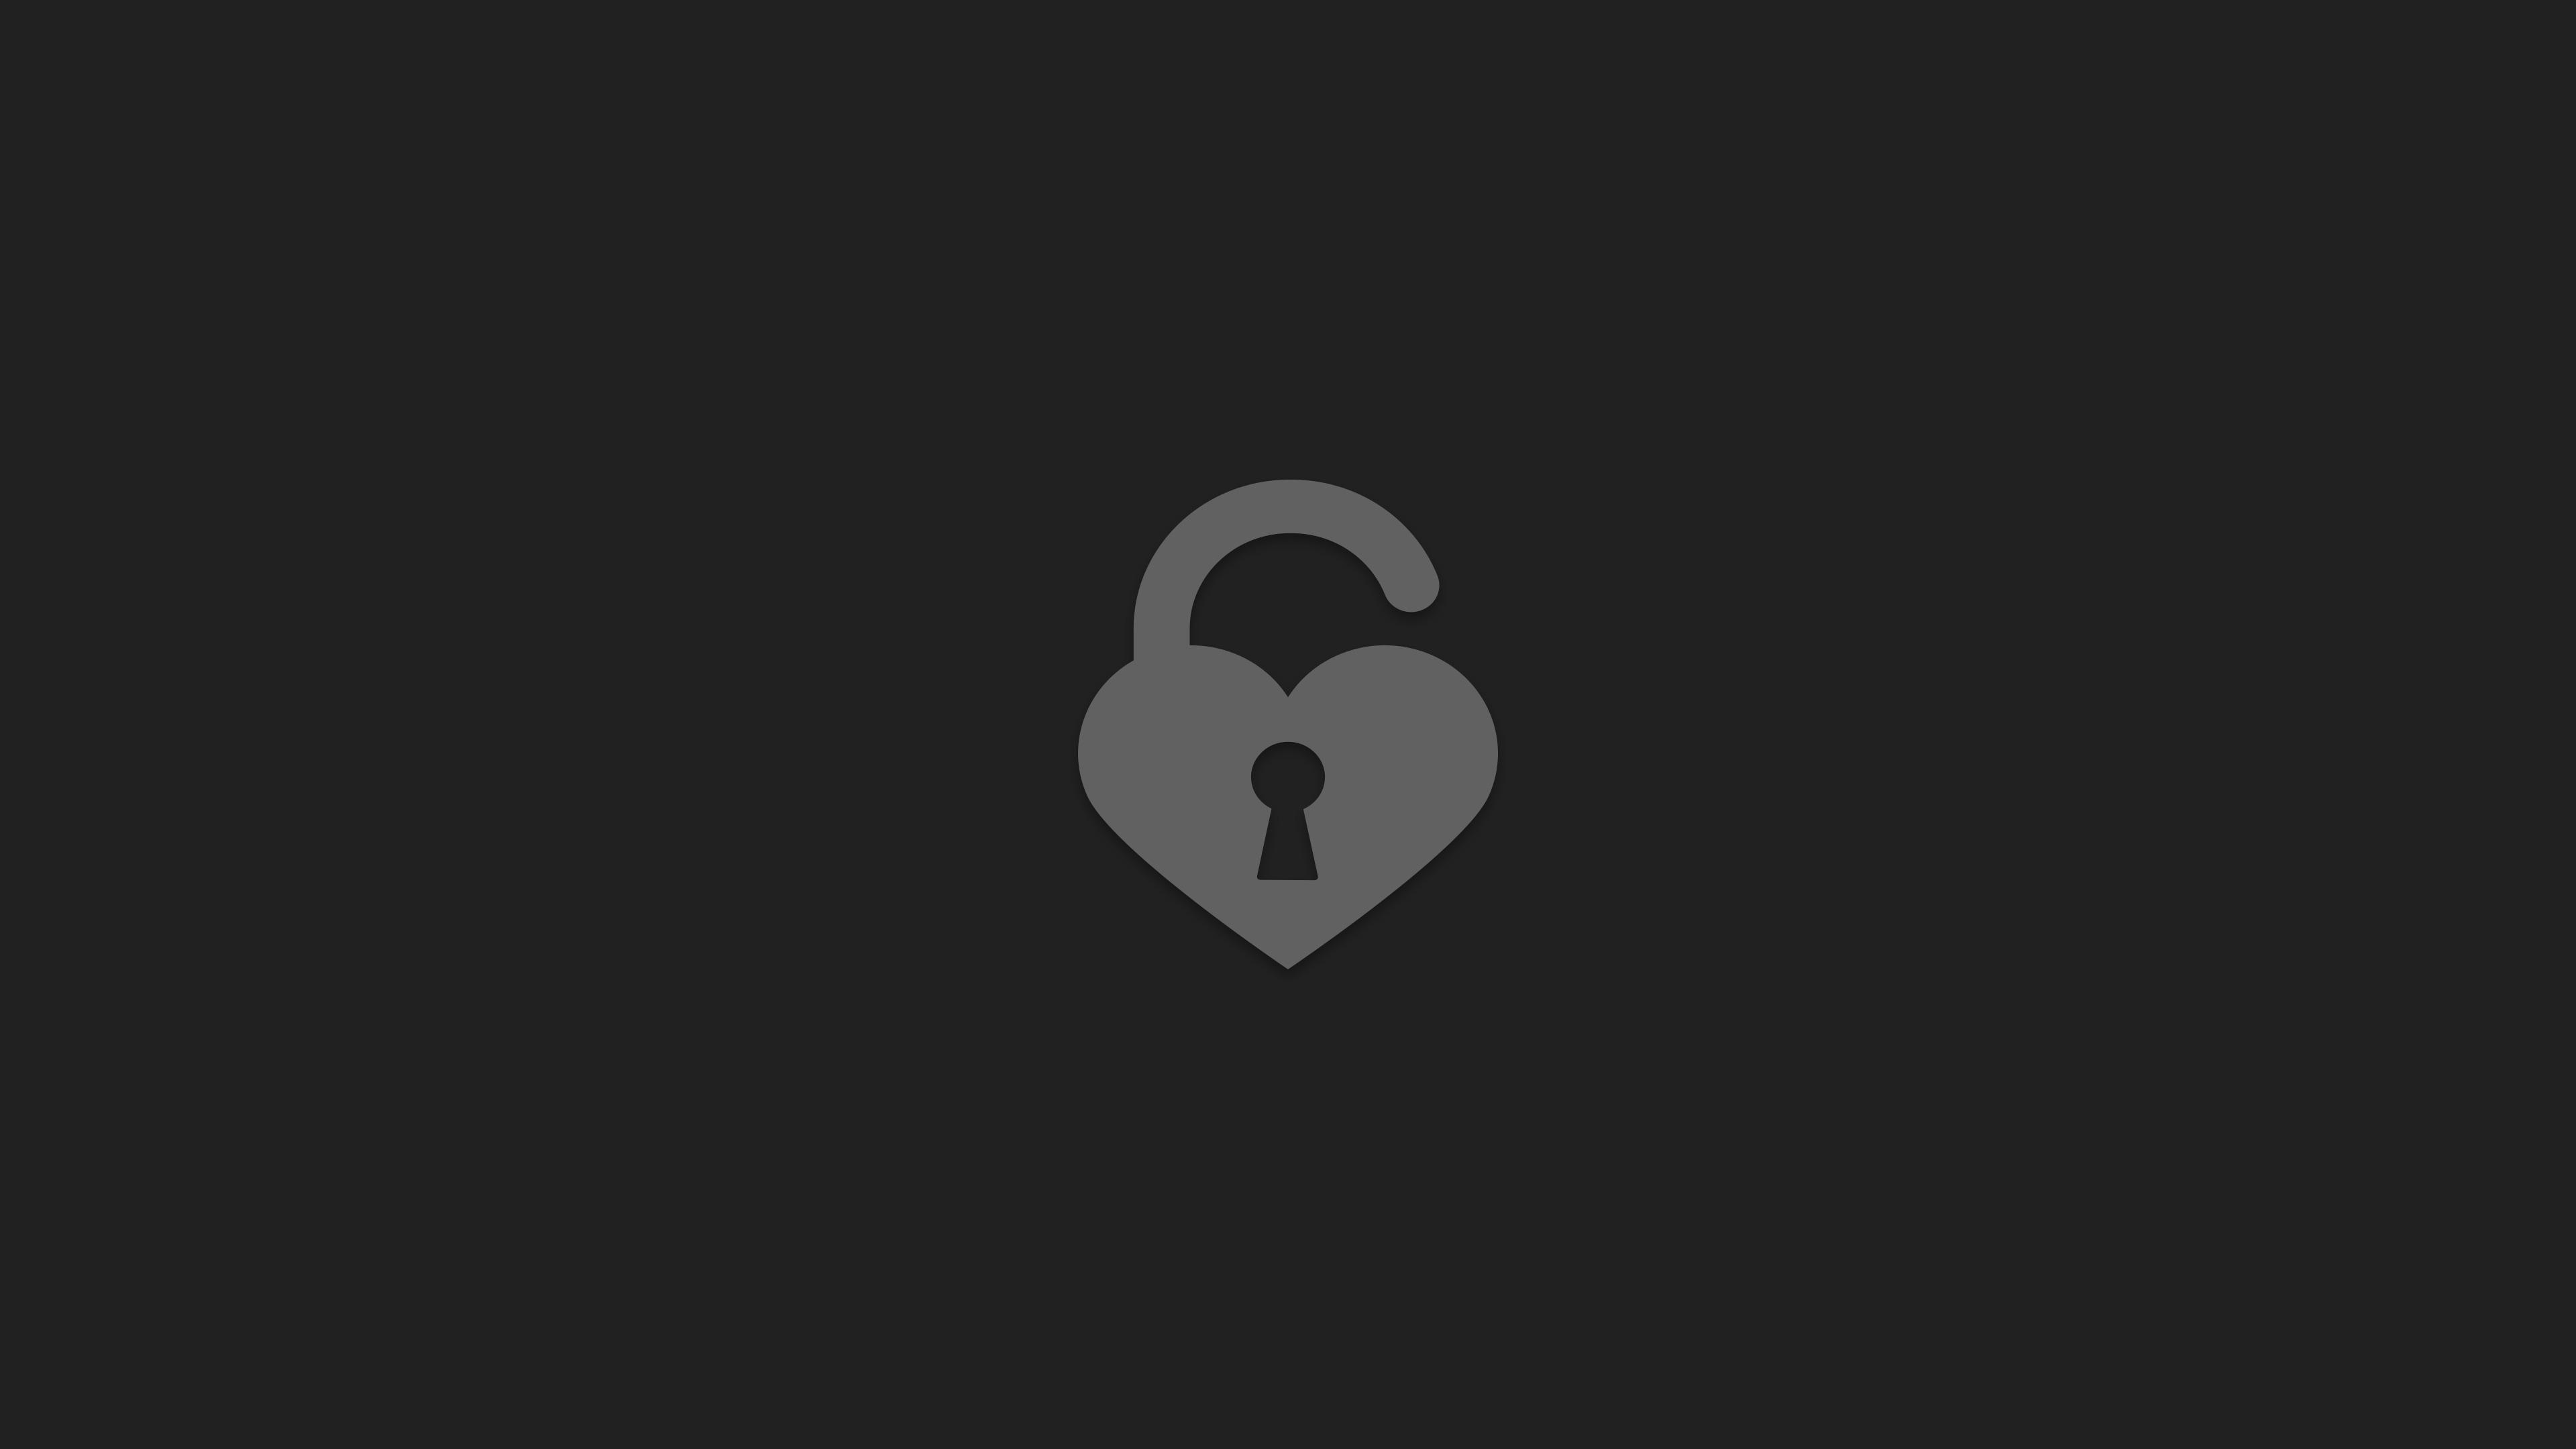 Wallpaper 4k Hear Unlock Minimalist 4k Artist Wallpapers